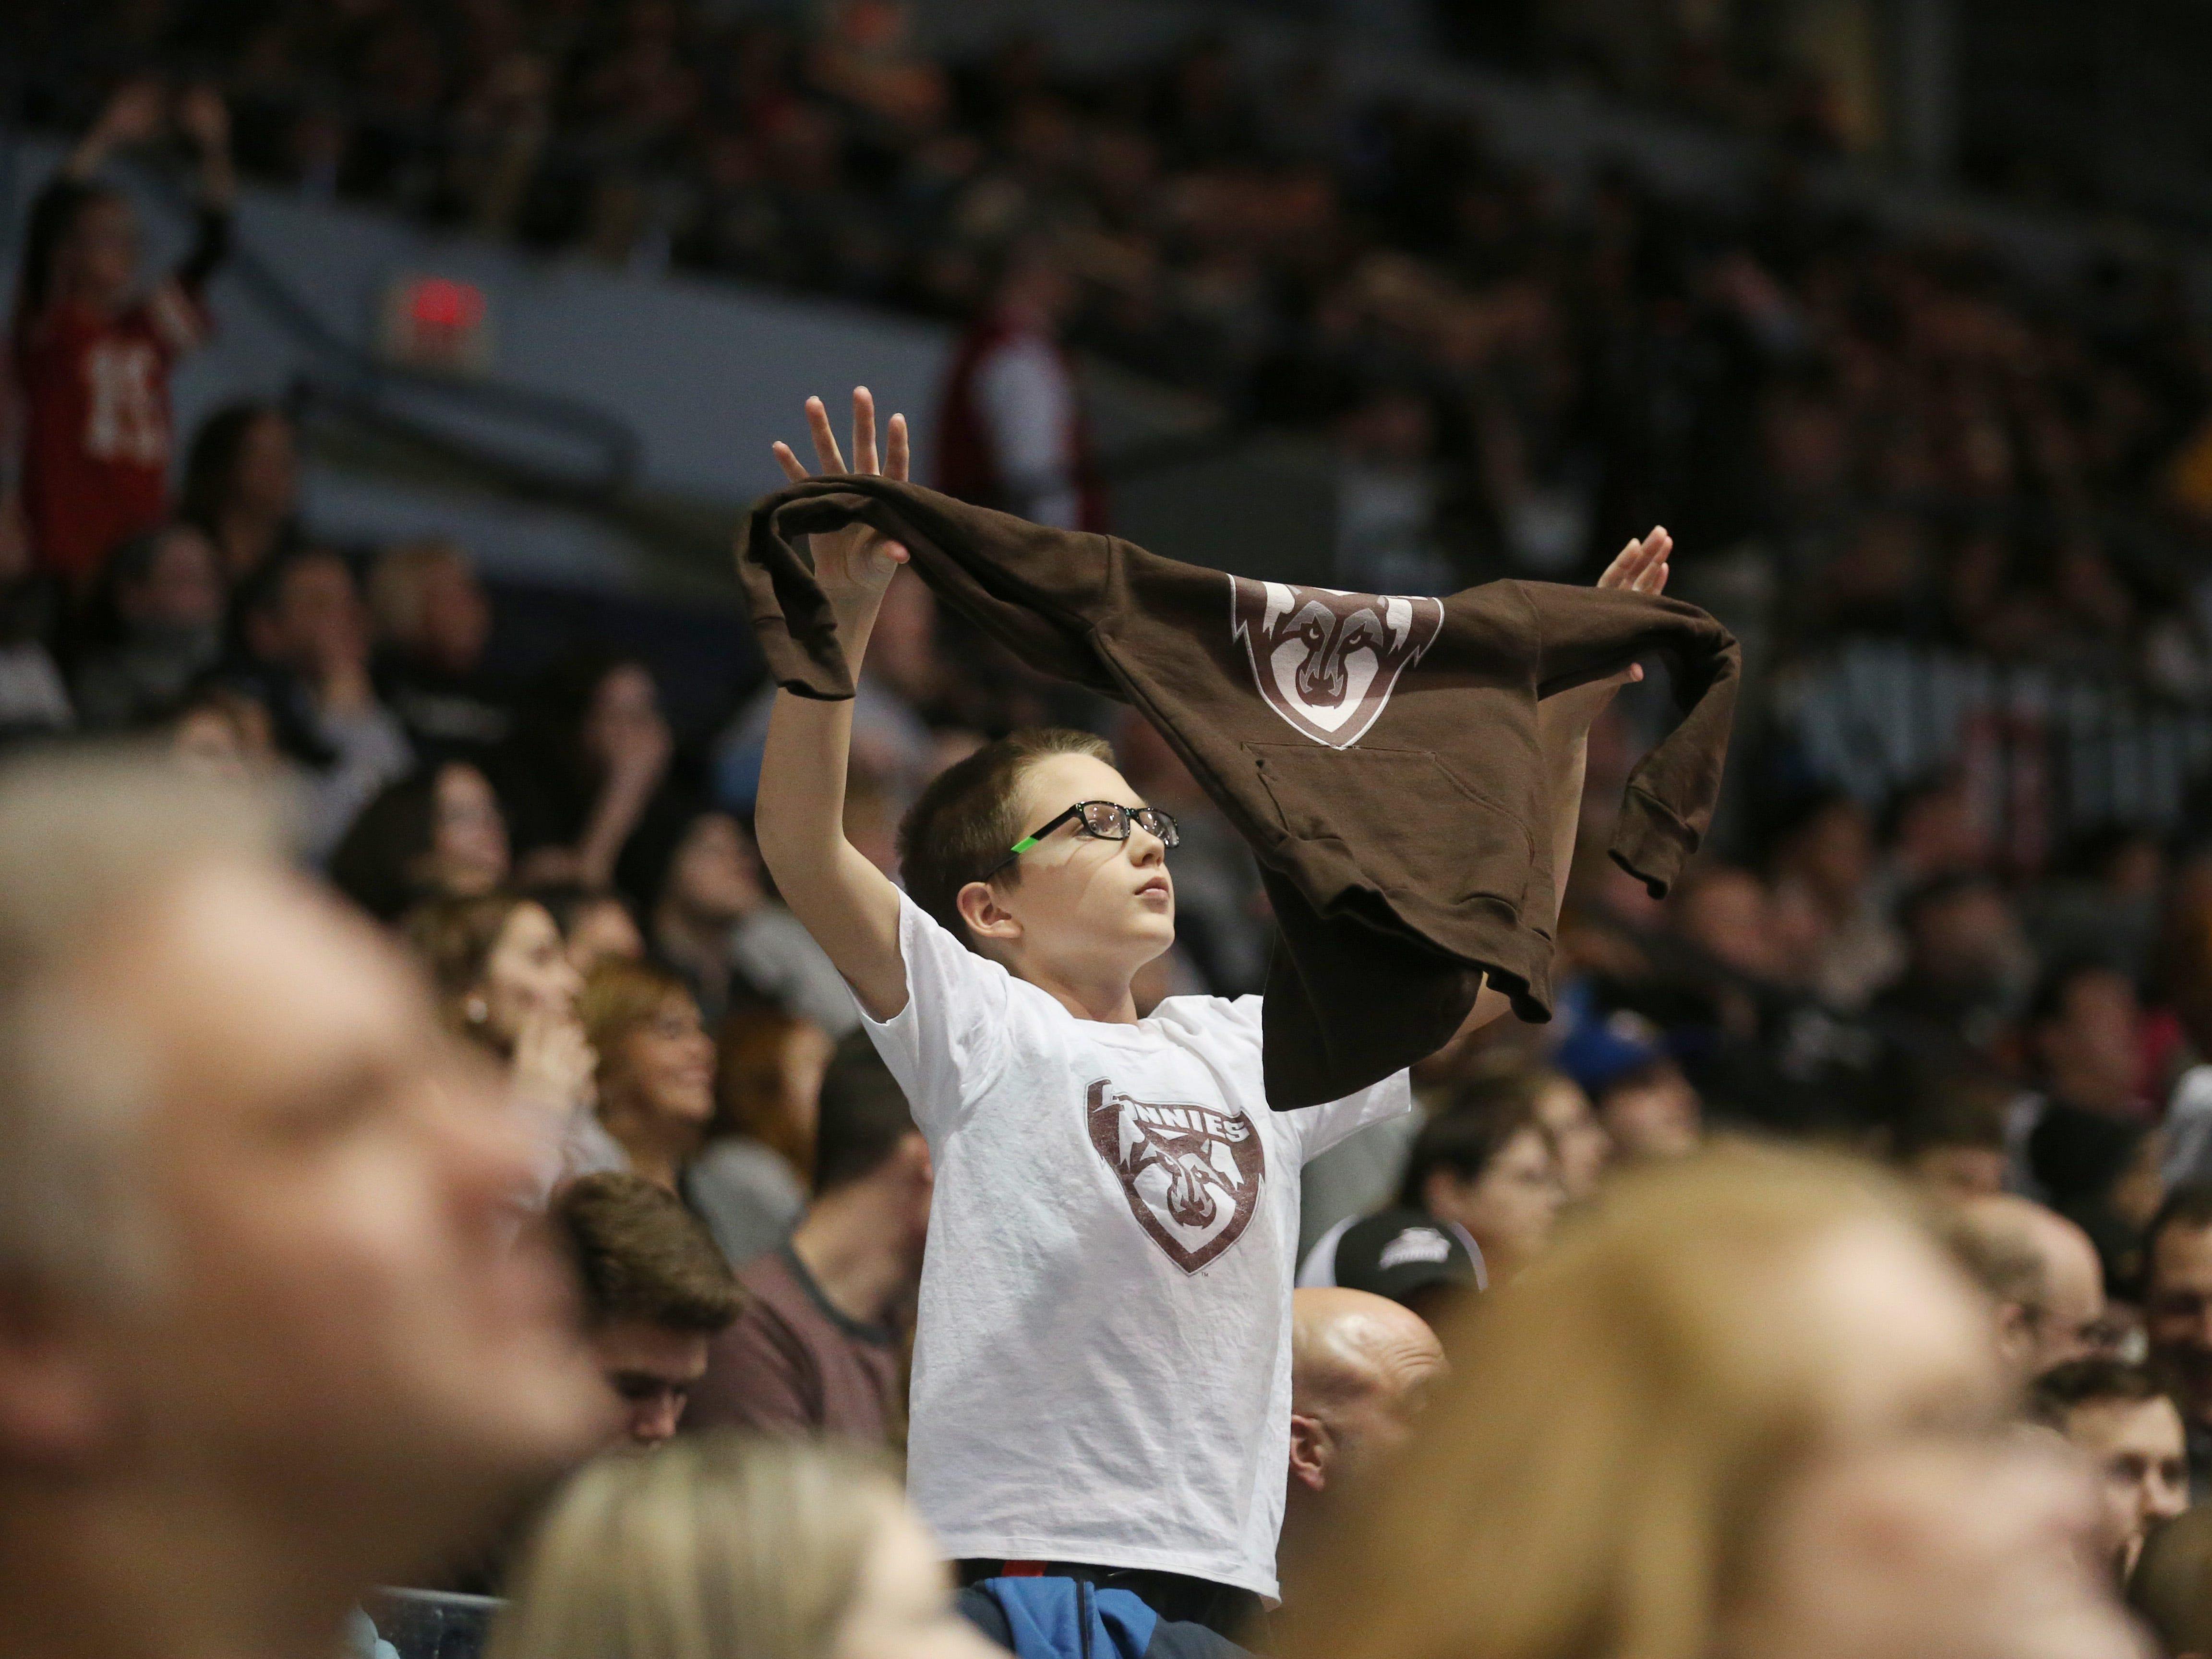 St. Bonaventure fans show their team spirit throughout the game.